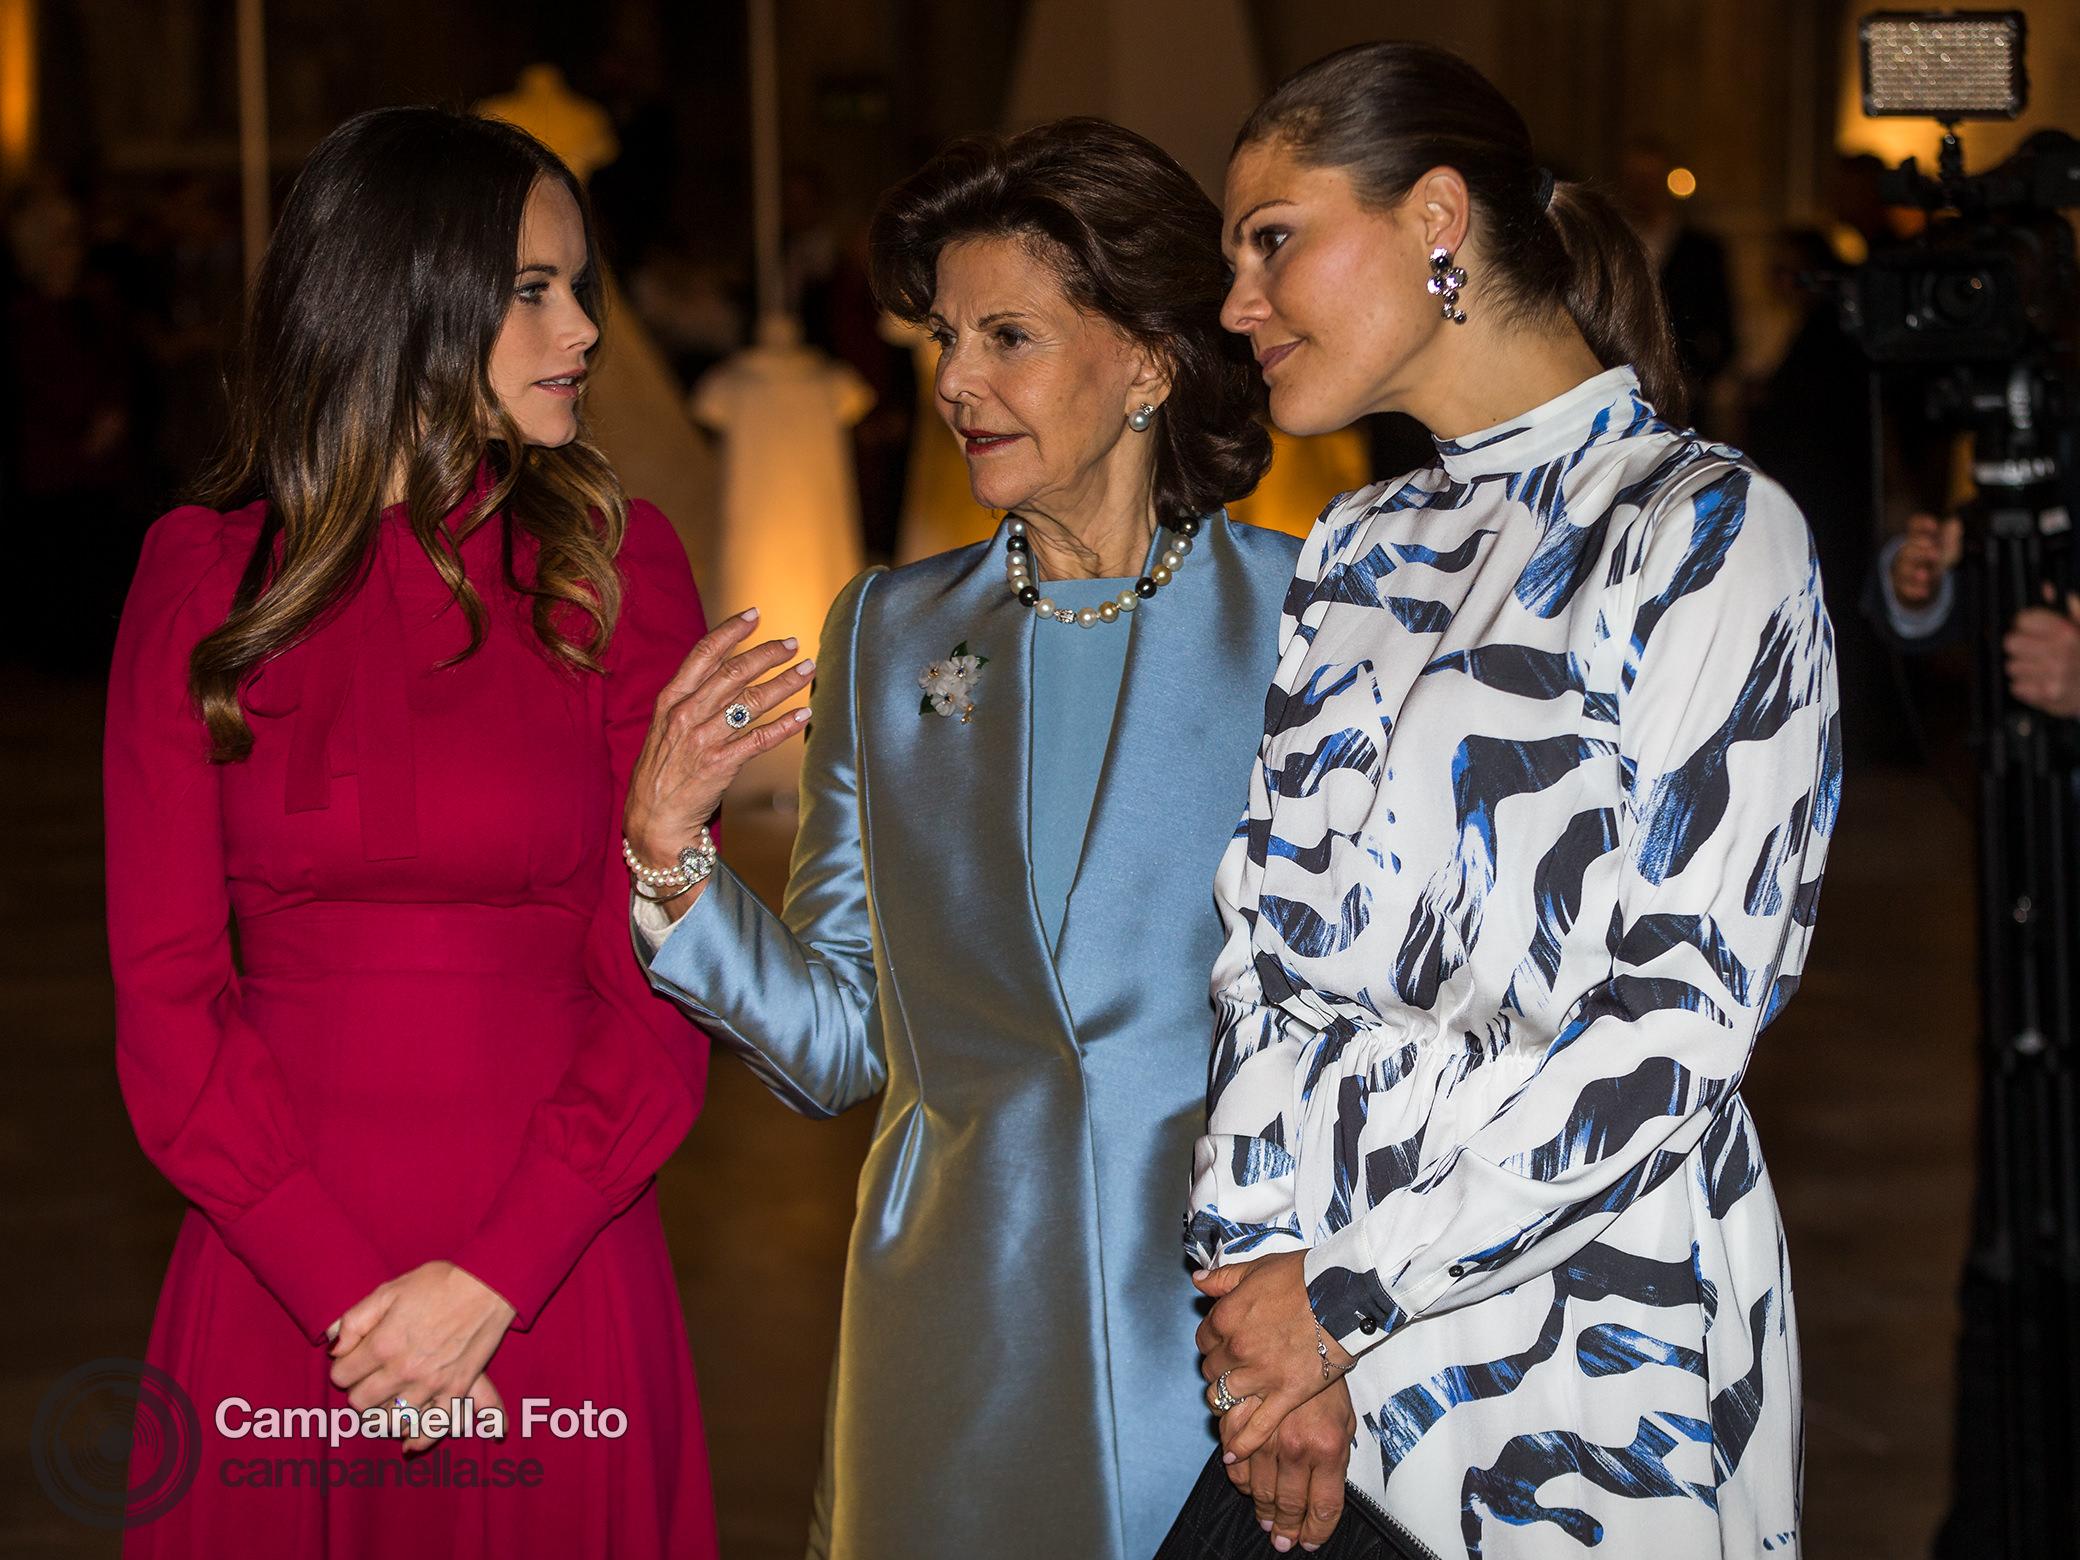 Royal wedding dresses exhibition - Michael Campanella Photography